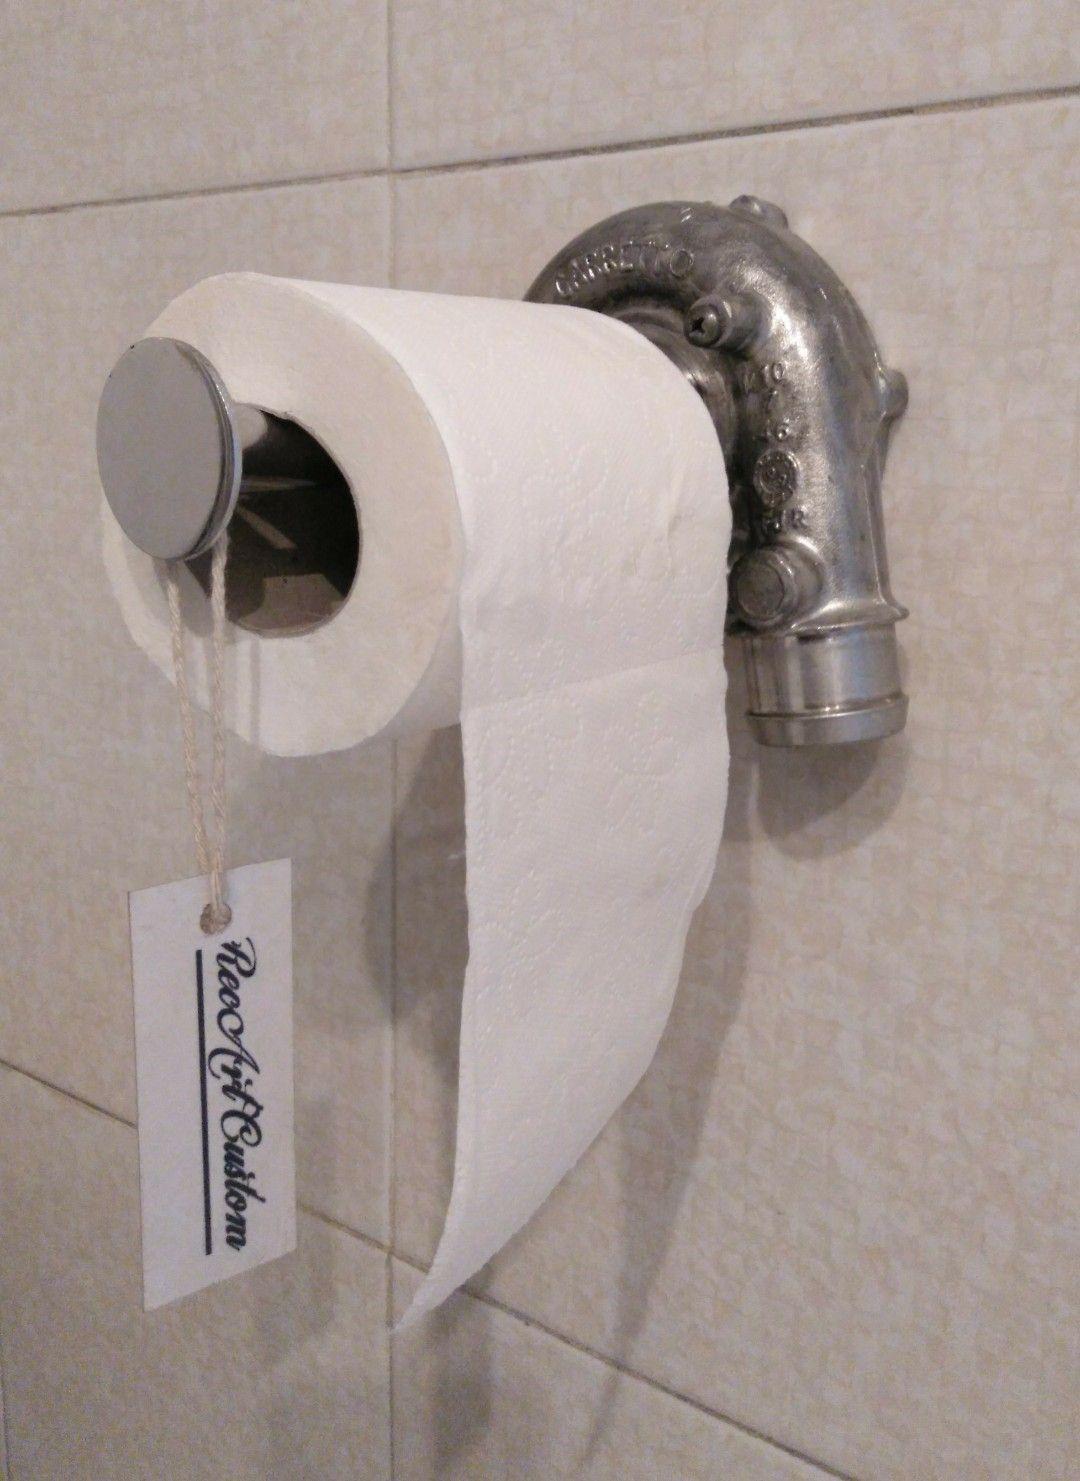 Turbocompresor Vw Porta Papel Higiénico Automotive Decor Automotive Decor Toilet Paper Toilet Paper Holder